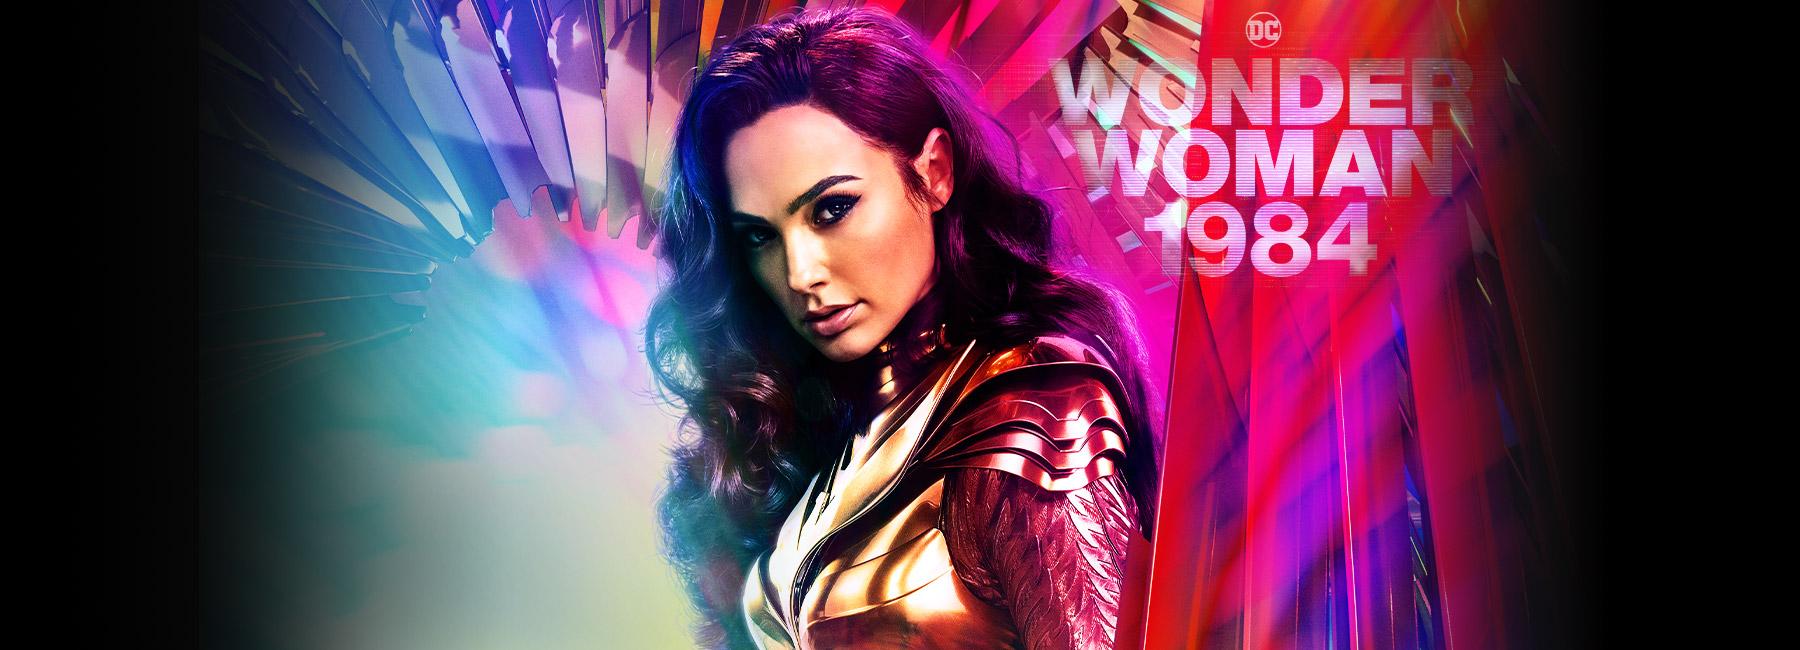 Sky X Wonder Woman 1984